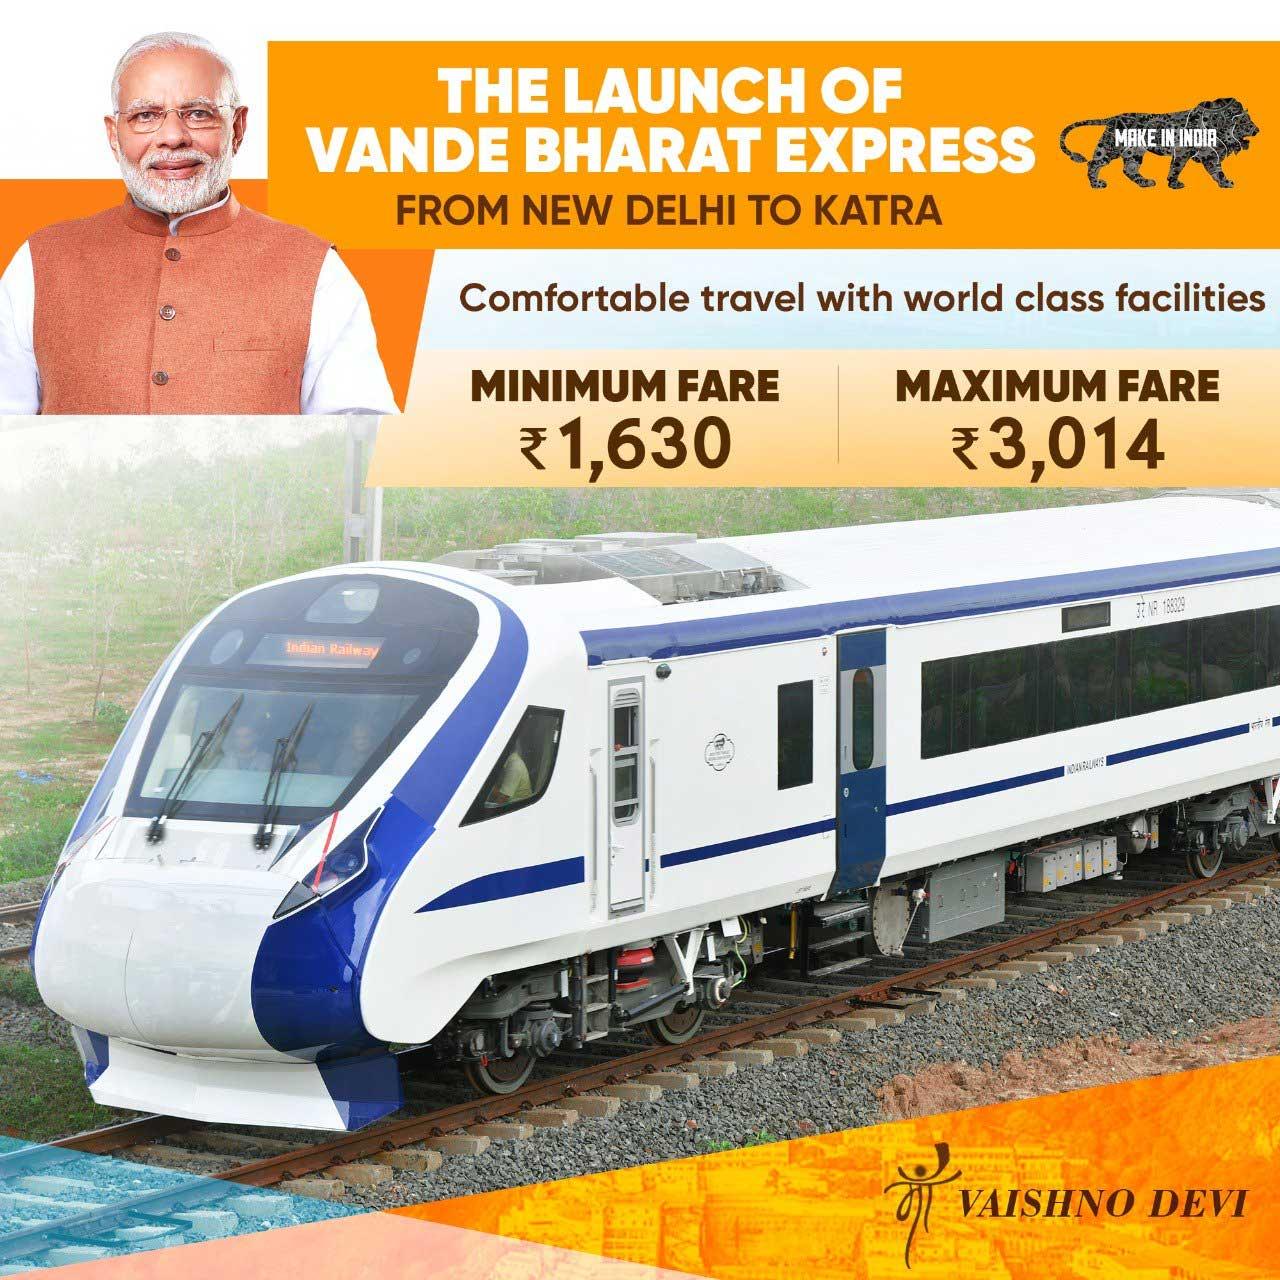 Vande Bharat Express realizes Gandhiji's vision of Swadeshi and fillips Narendra Modi's Make in India